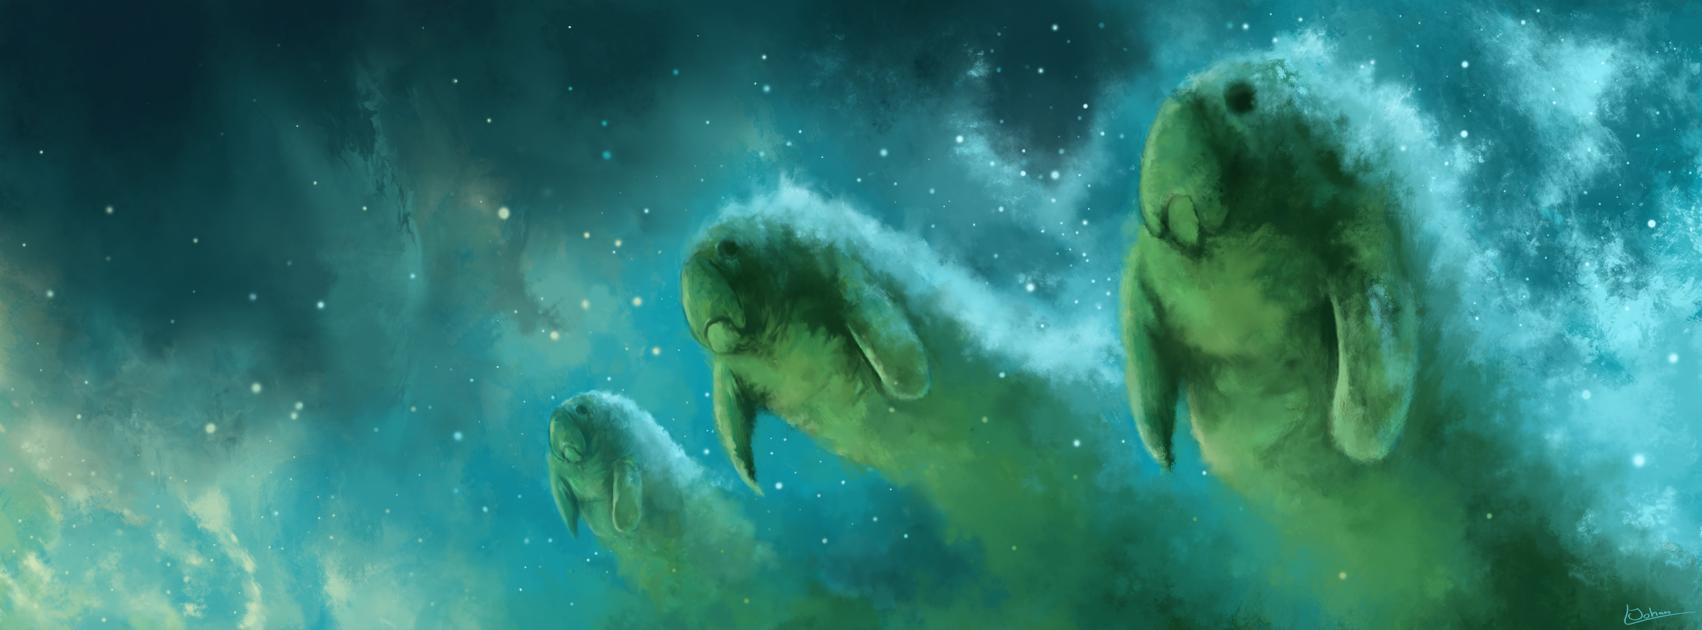 manatee nebula by kubeen on deviantart